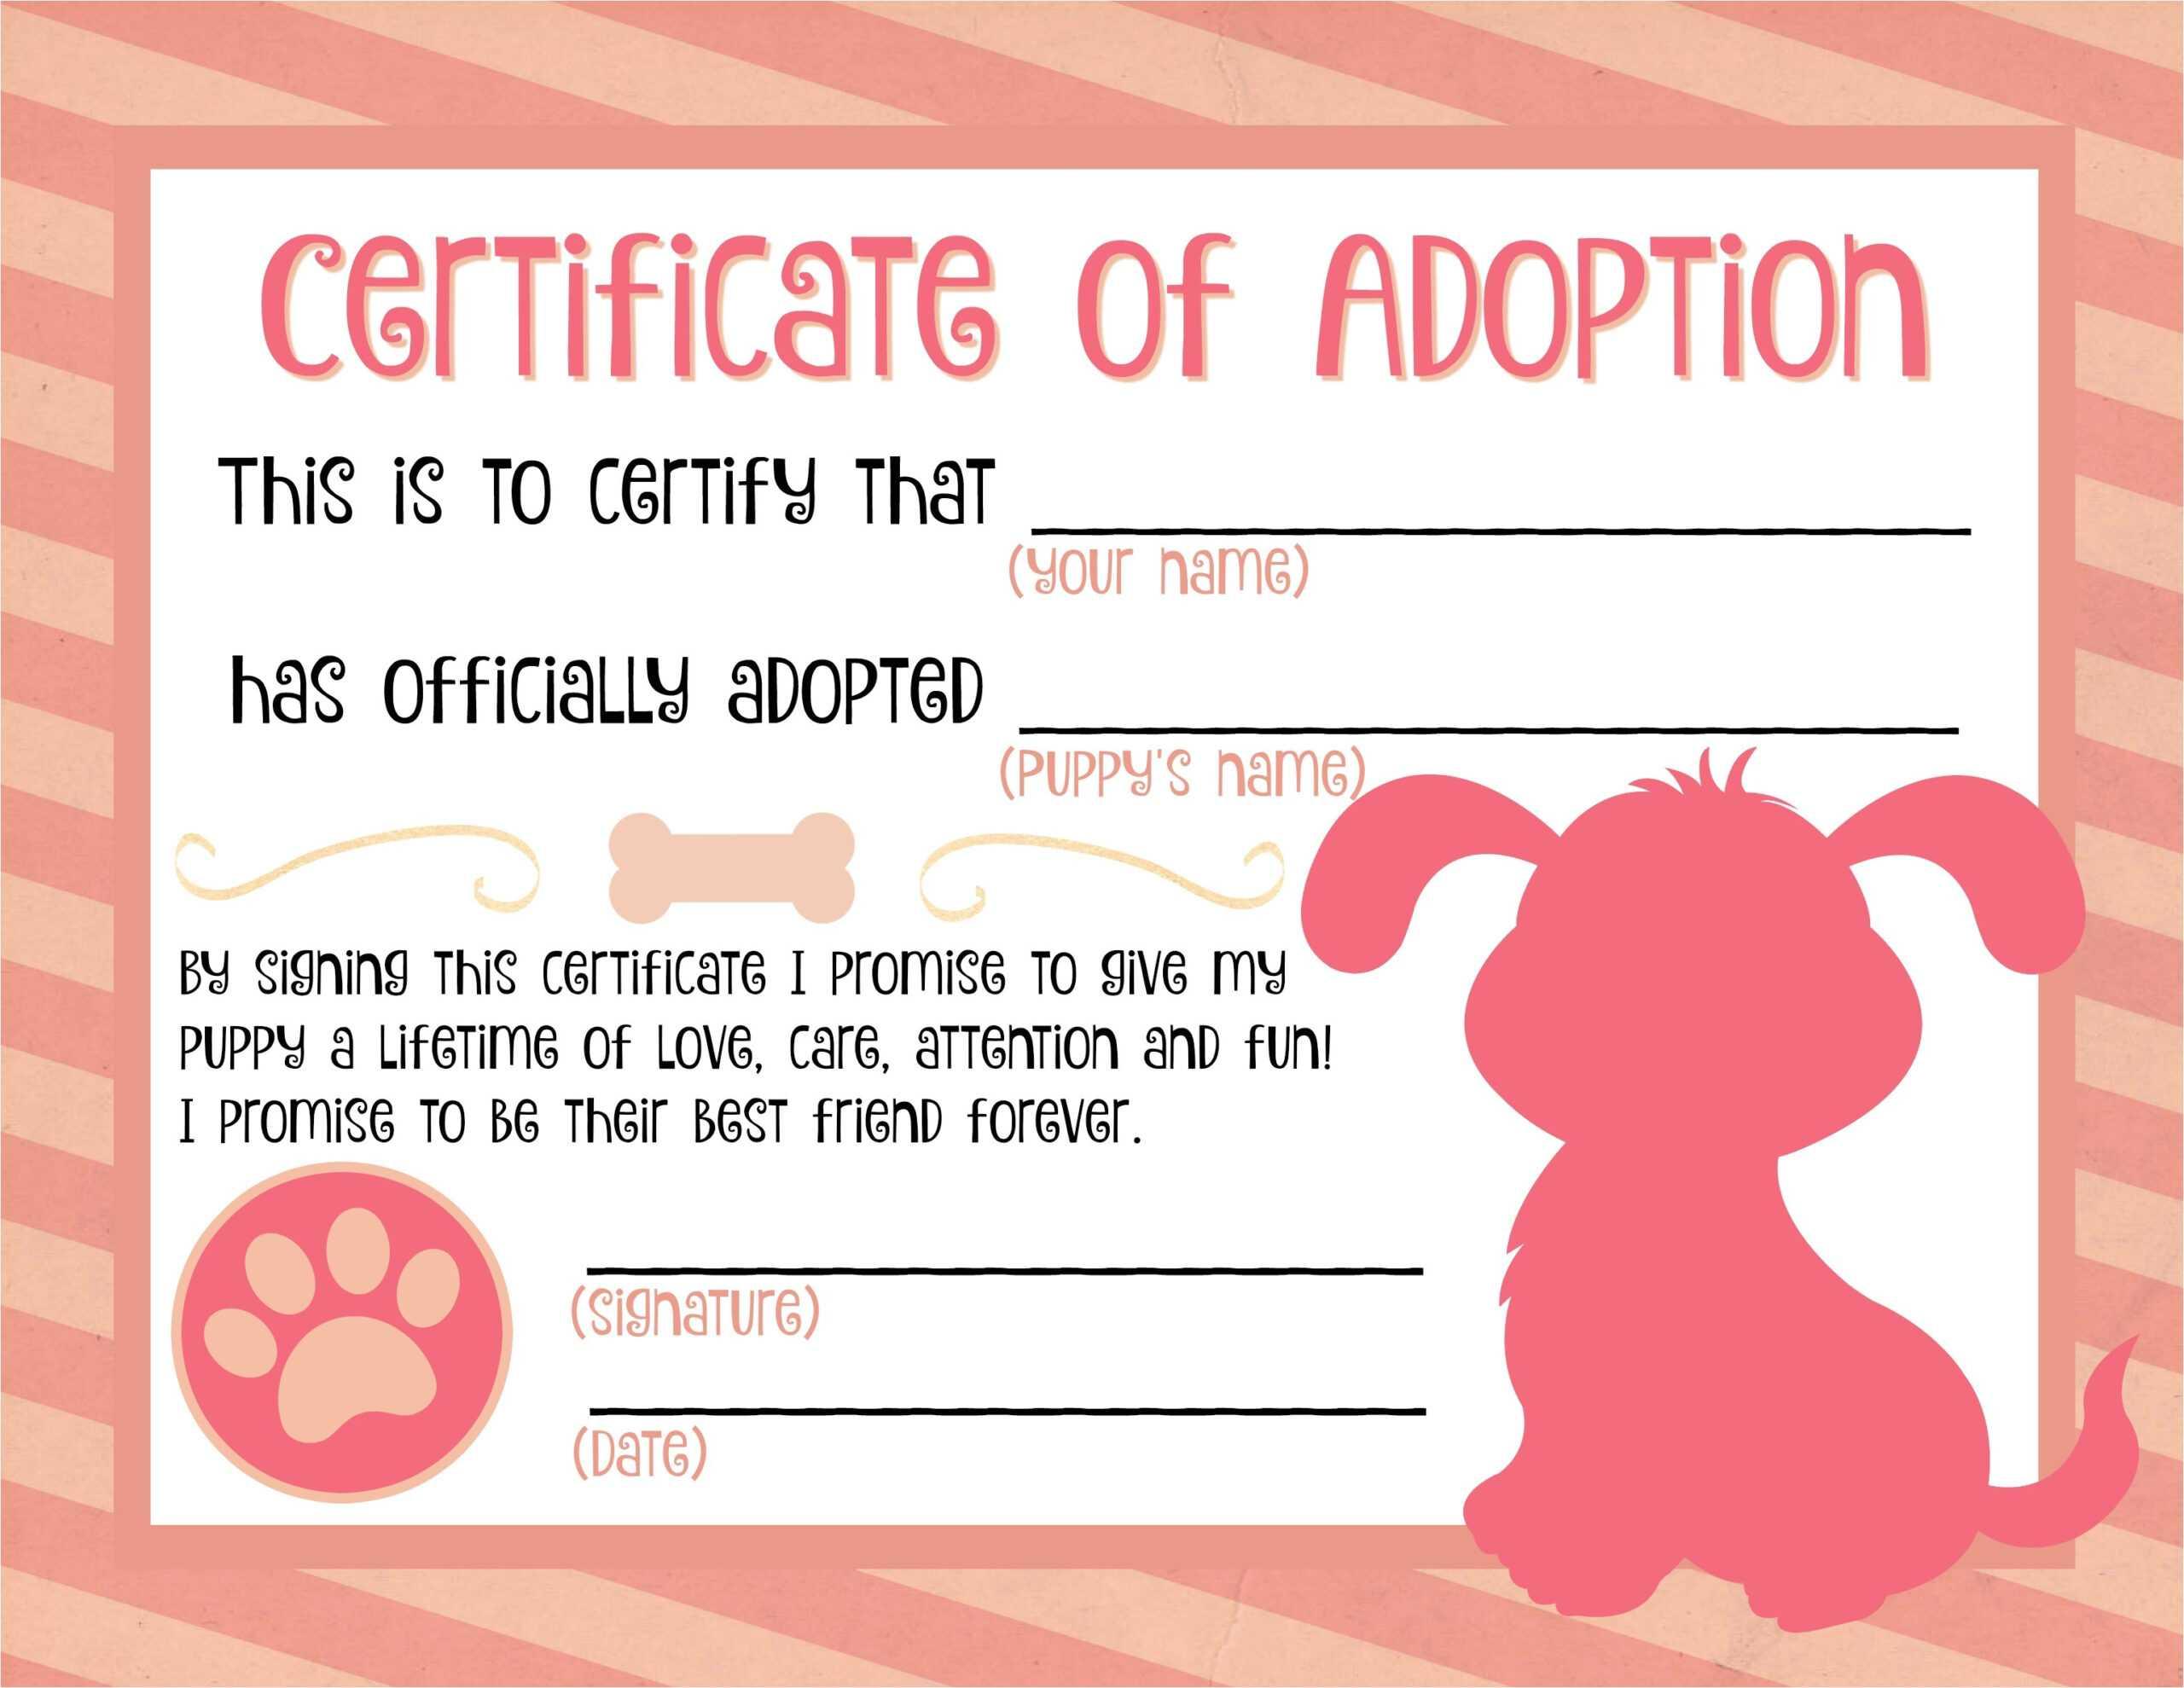 Child Adoption Certificate Template - Dalep.midnightpig.co Within Child Adoption Certificate Template